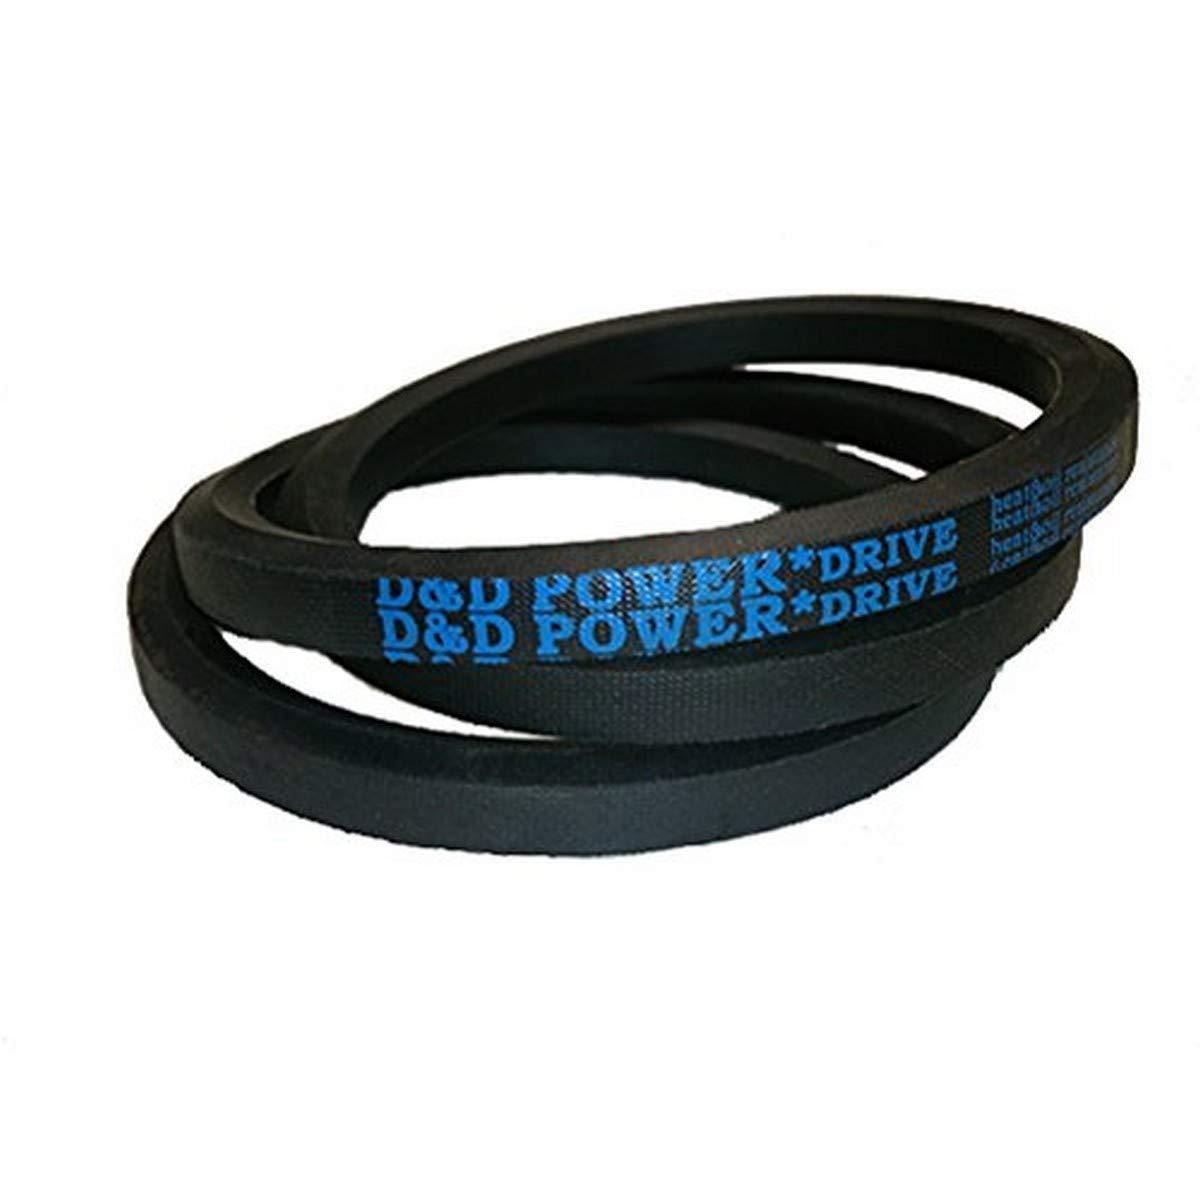 D/&D PowerDrive 724301 CLAAS Replacement Belt Rubber 111 Length 1 Band 111 Length